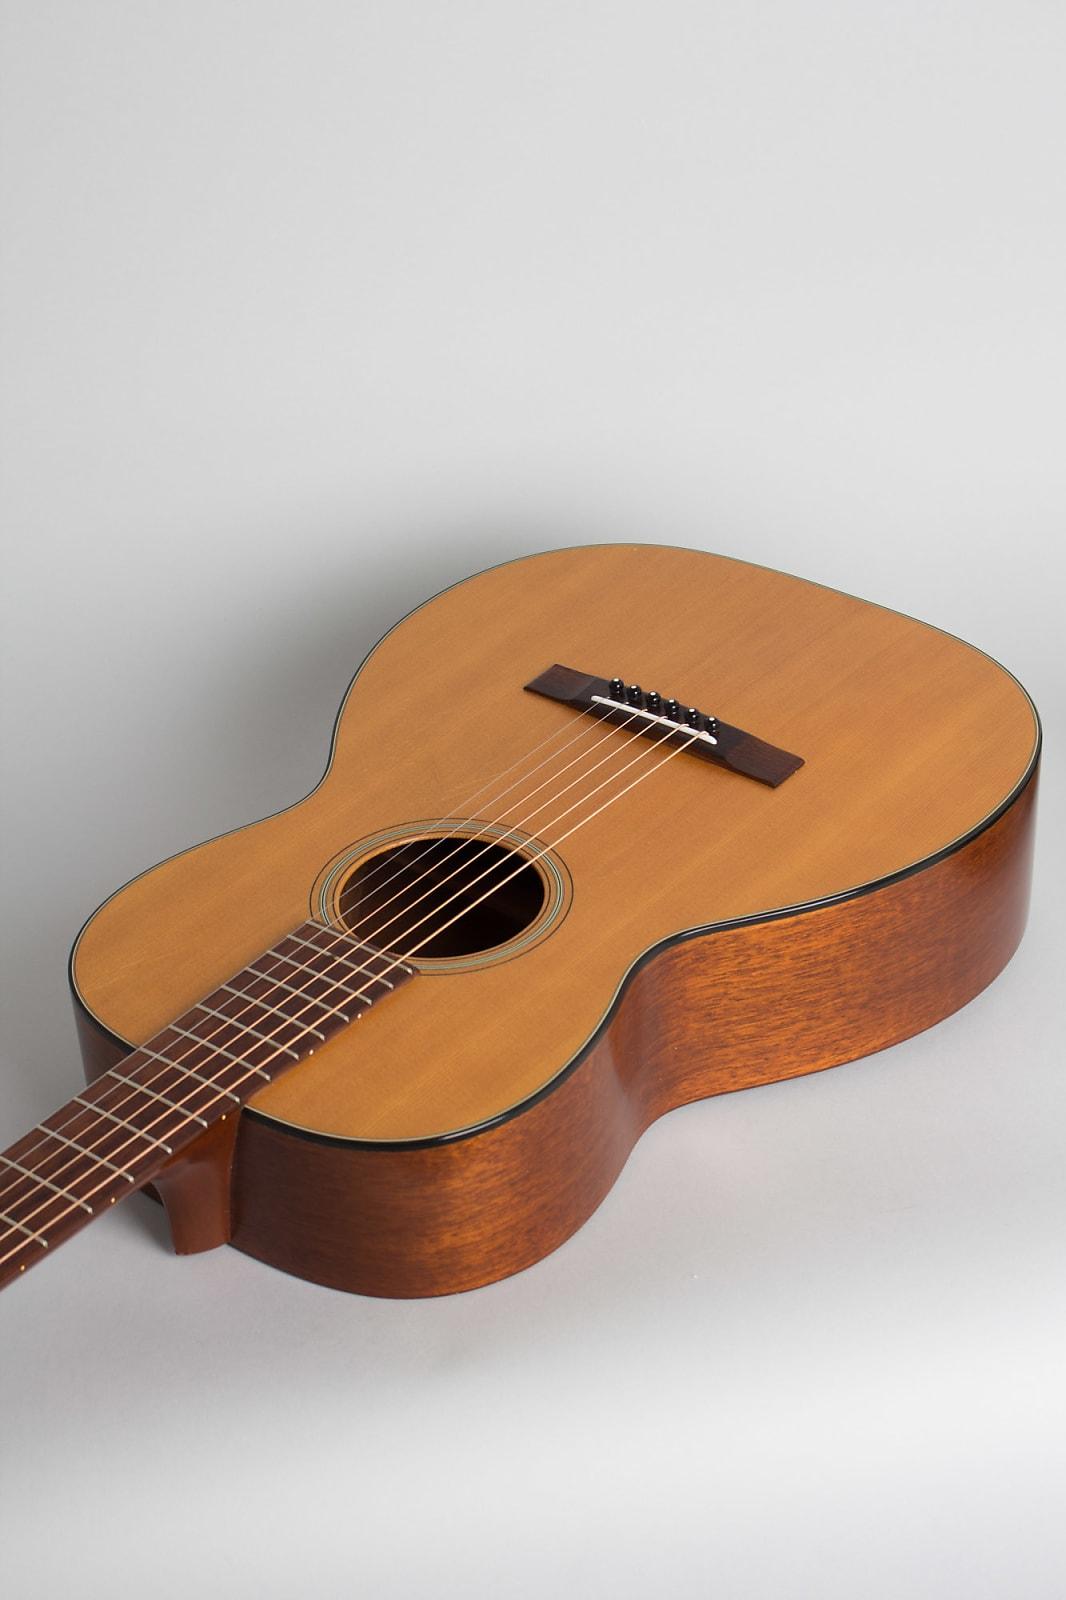 C. F. Martin  0-16NY Flat Top Acoustic Guitar (1968), ser. #231949, black chipboard case.